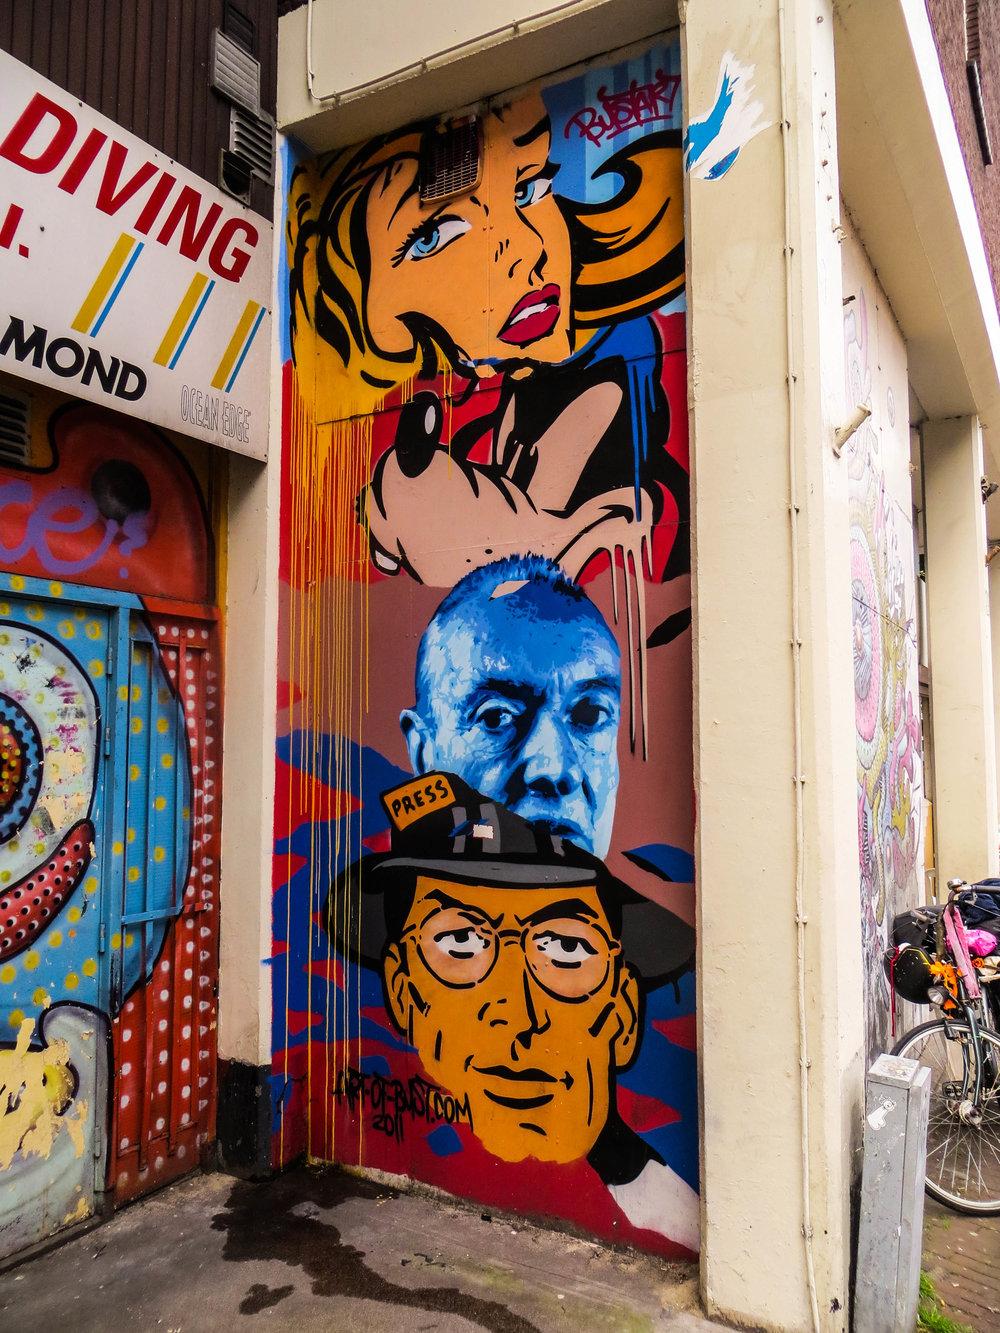 amsterdam-netherlands-street-photography-47.jpg